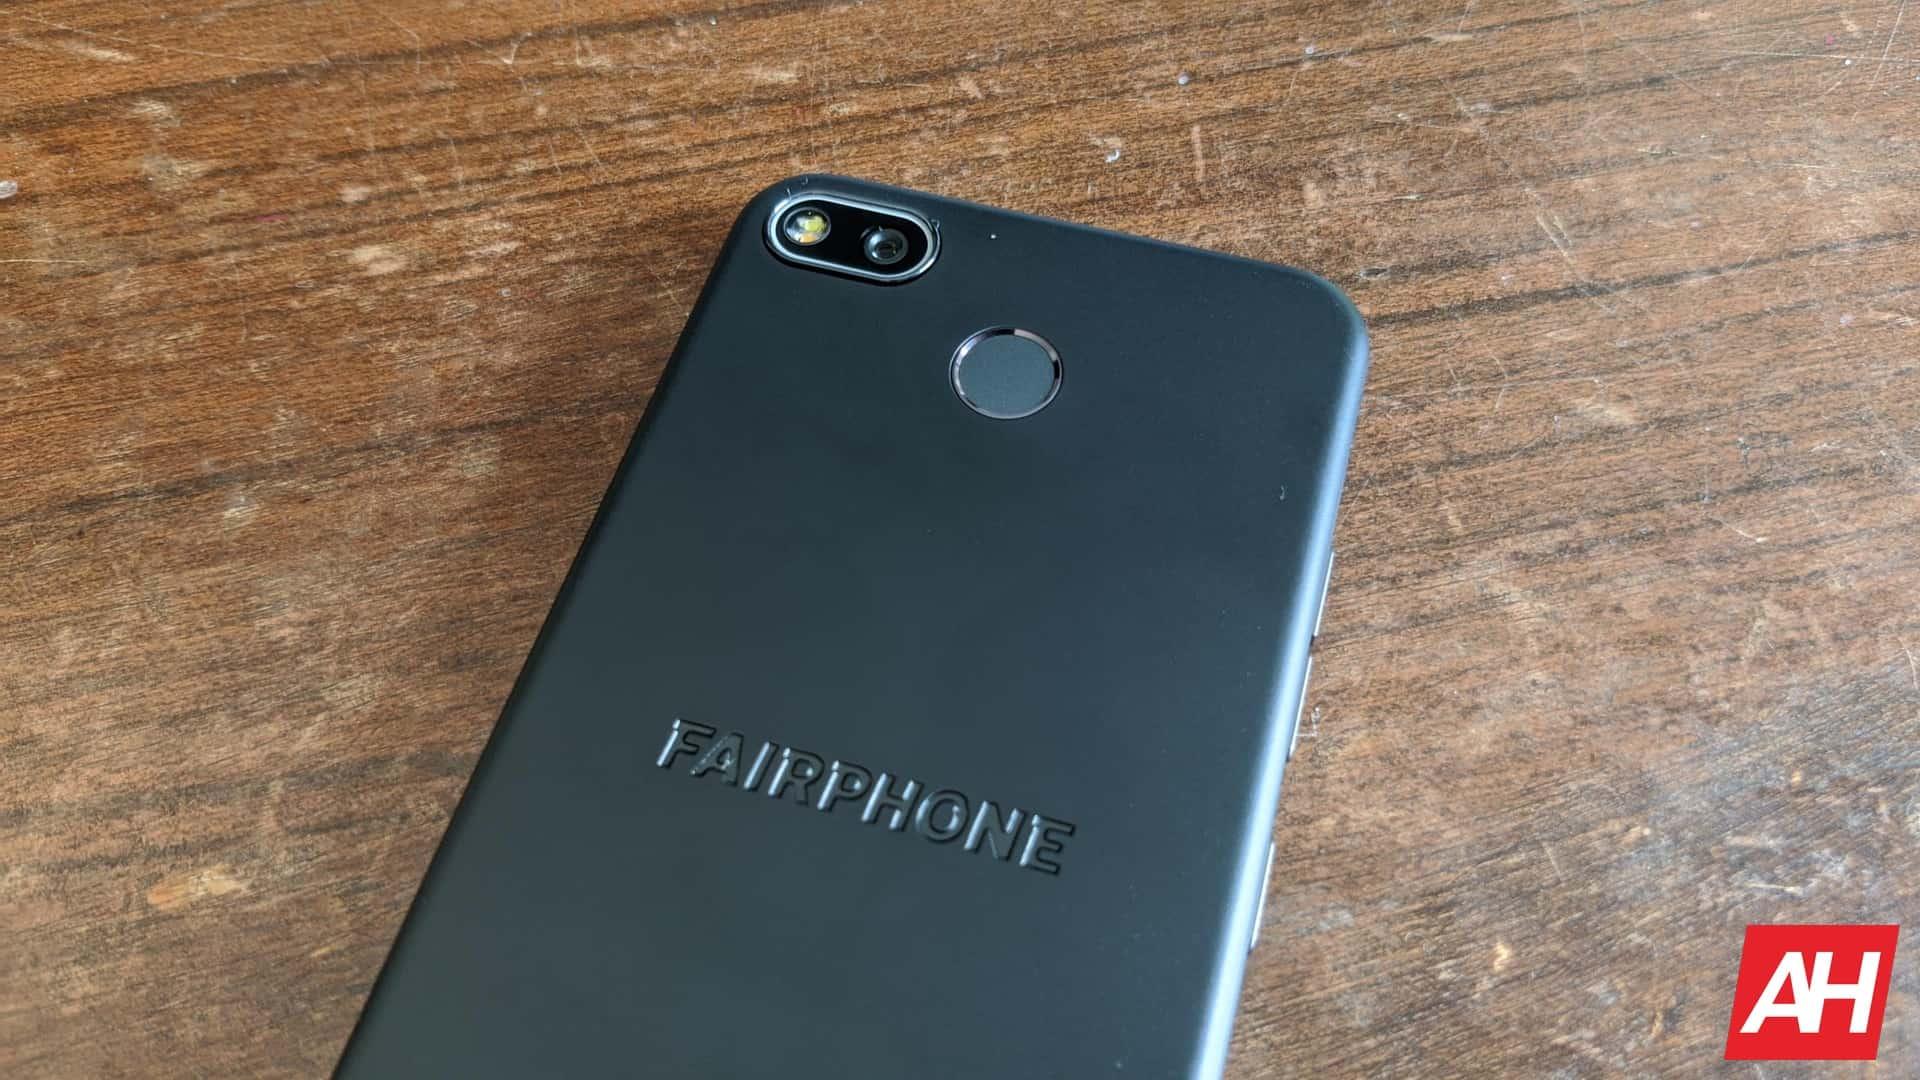 AH Fairphone 3 Plus image 14